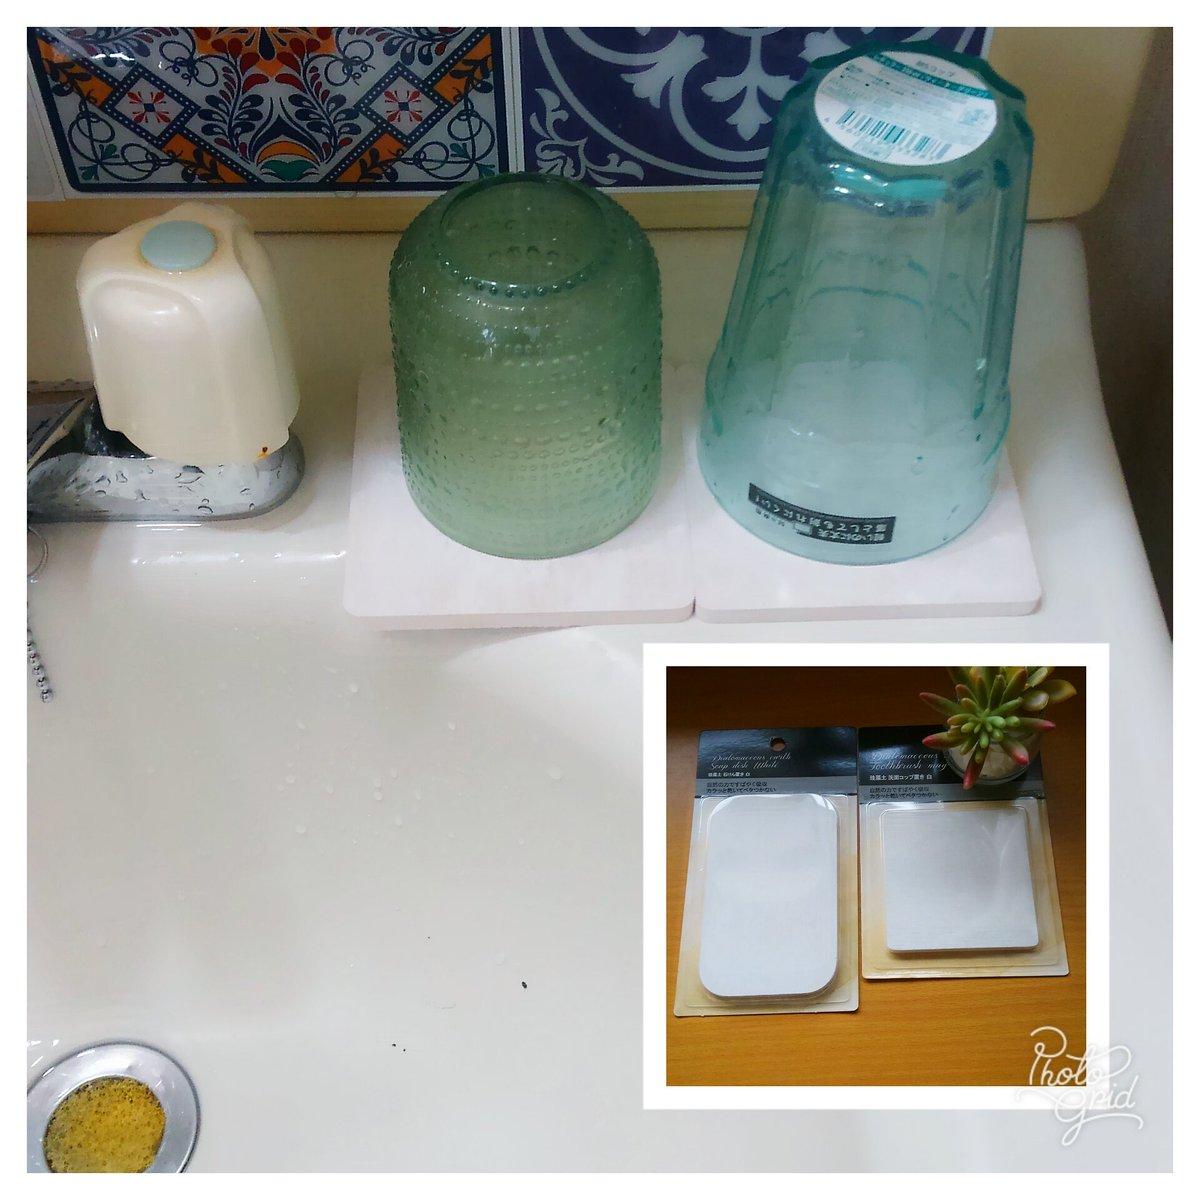 test ツイッターメディア - 昨日、キャンドゥで、 洗面台の水垢防止に、 珪藻土のコップ置きと、 石けん置きを買いました。  #キャンドゥ #珪藻土 #石けん置き #コップ置き https://t.co/IJOellE4eN